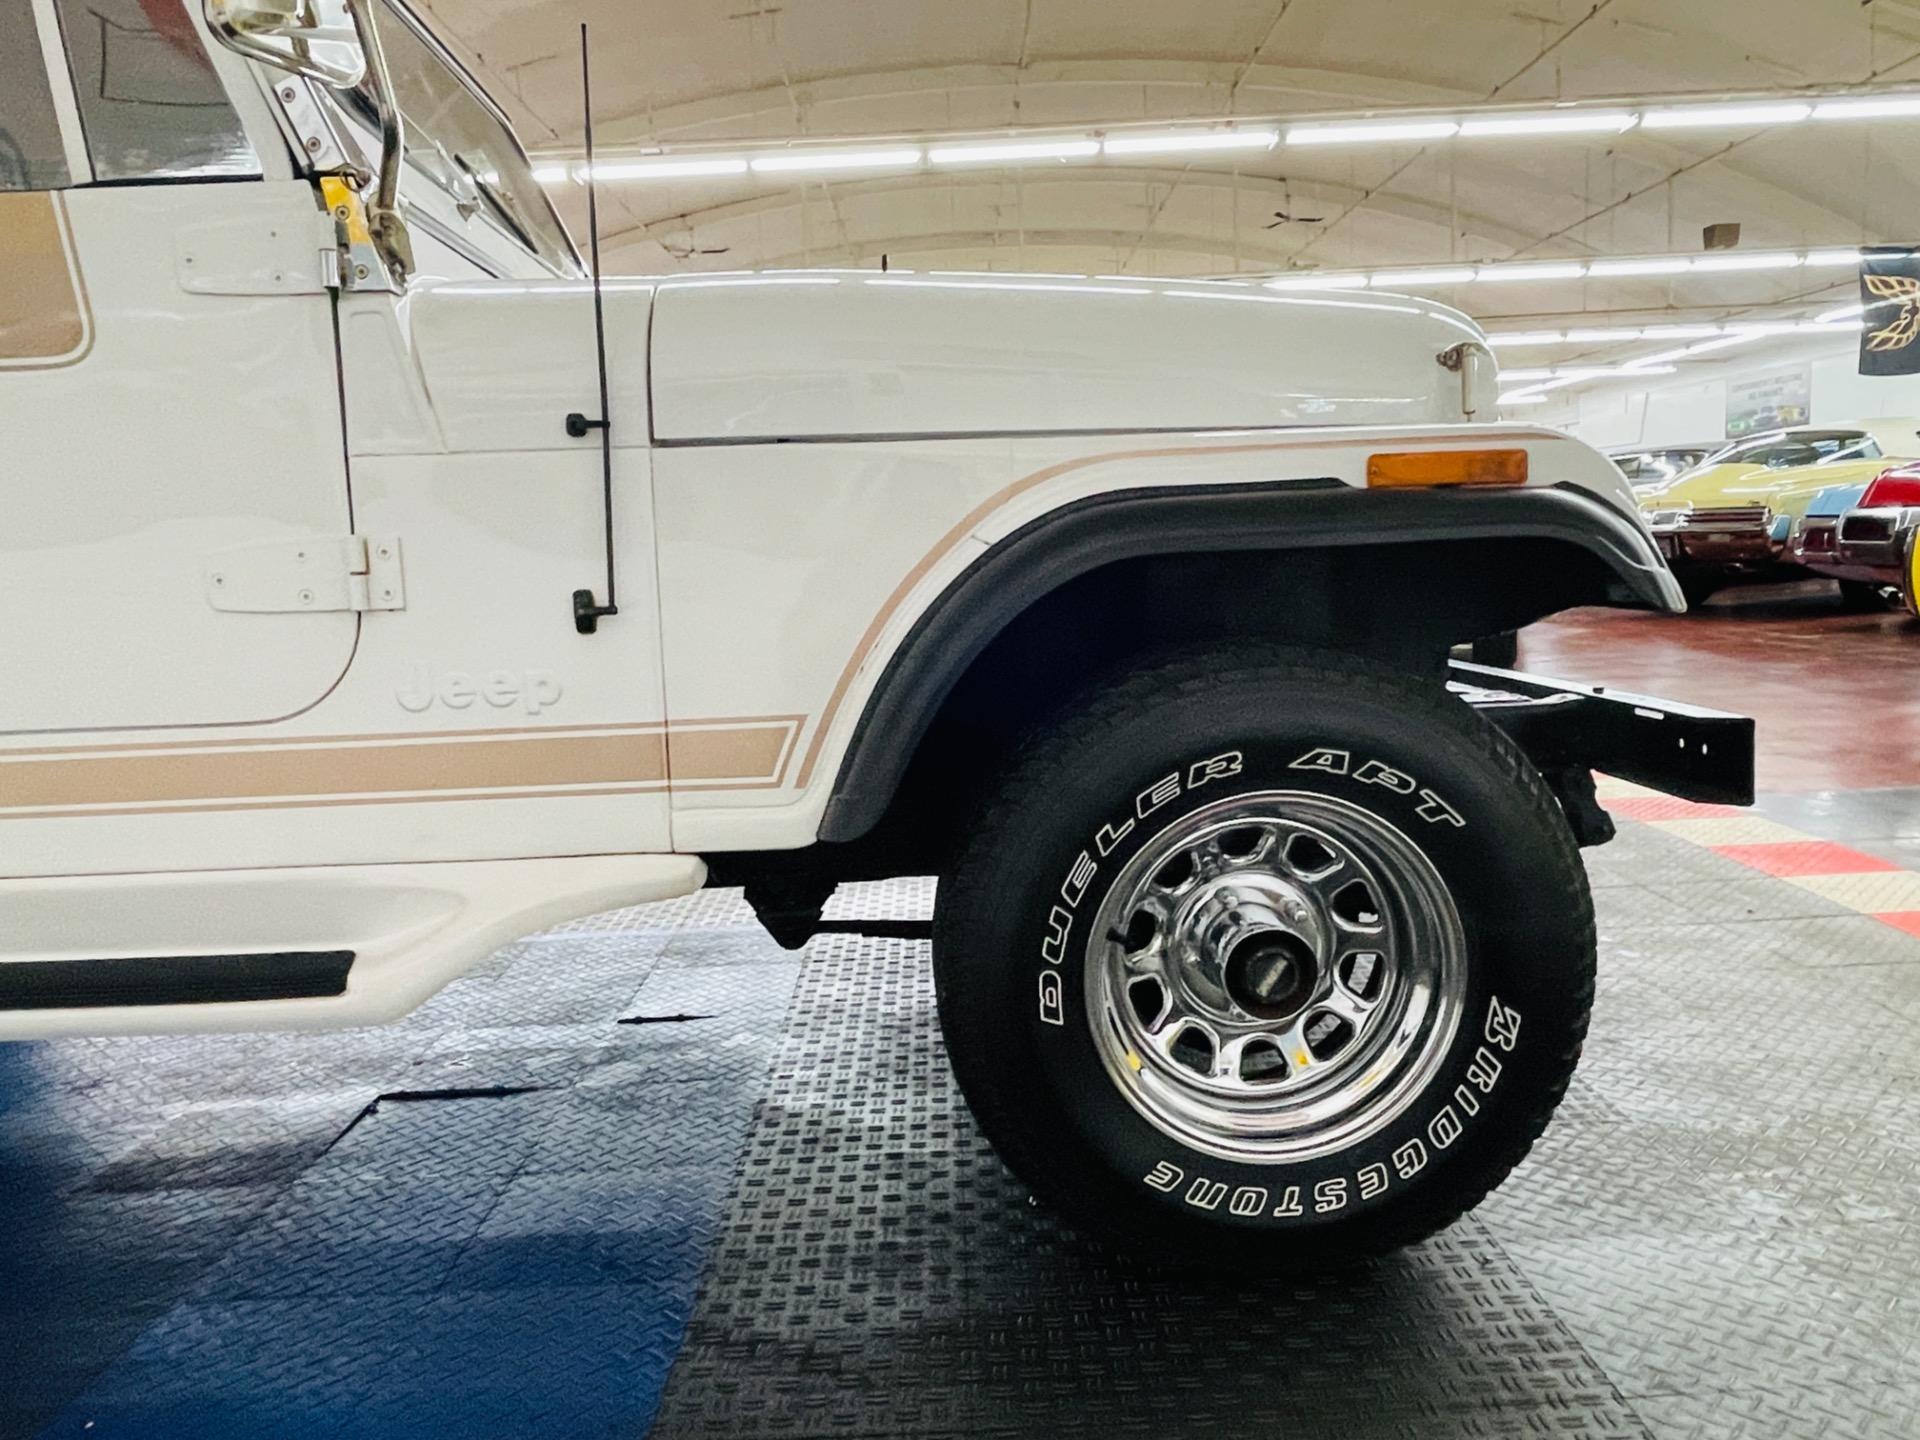 Used 1981 Jeep Scrambler - 4 WHEEL DRIVE - AUTO TRANS - TWO TOPS -   Mundelein, IL